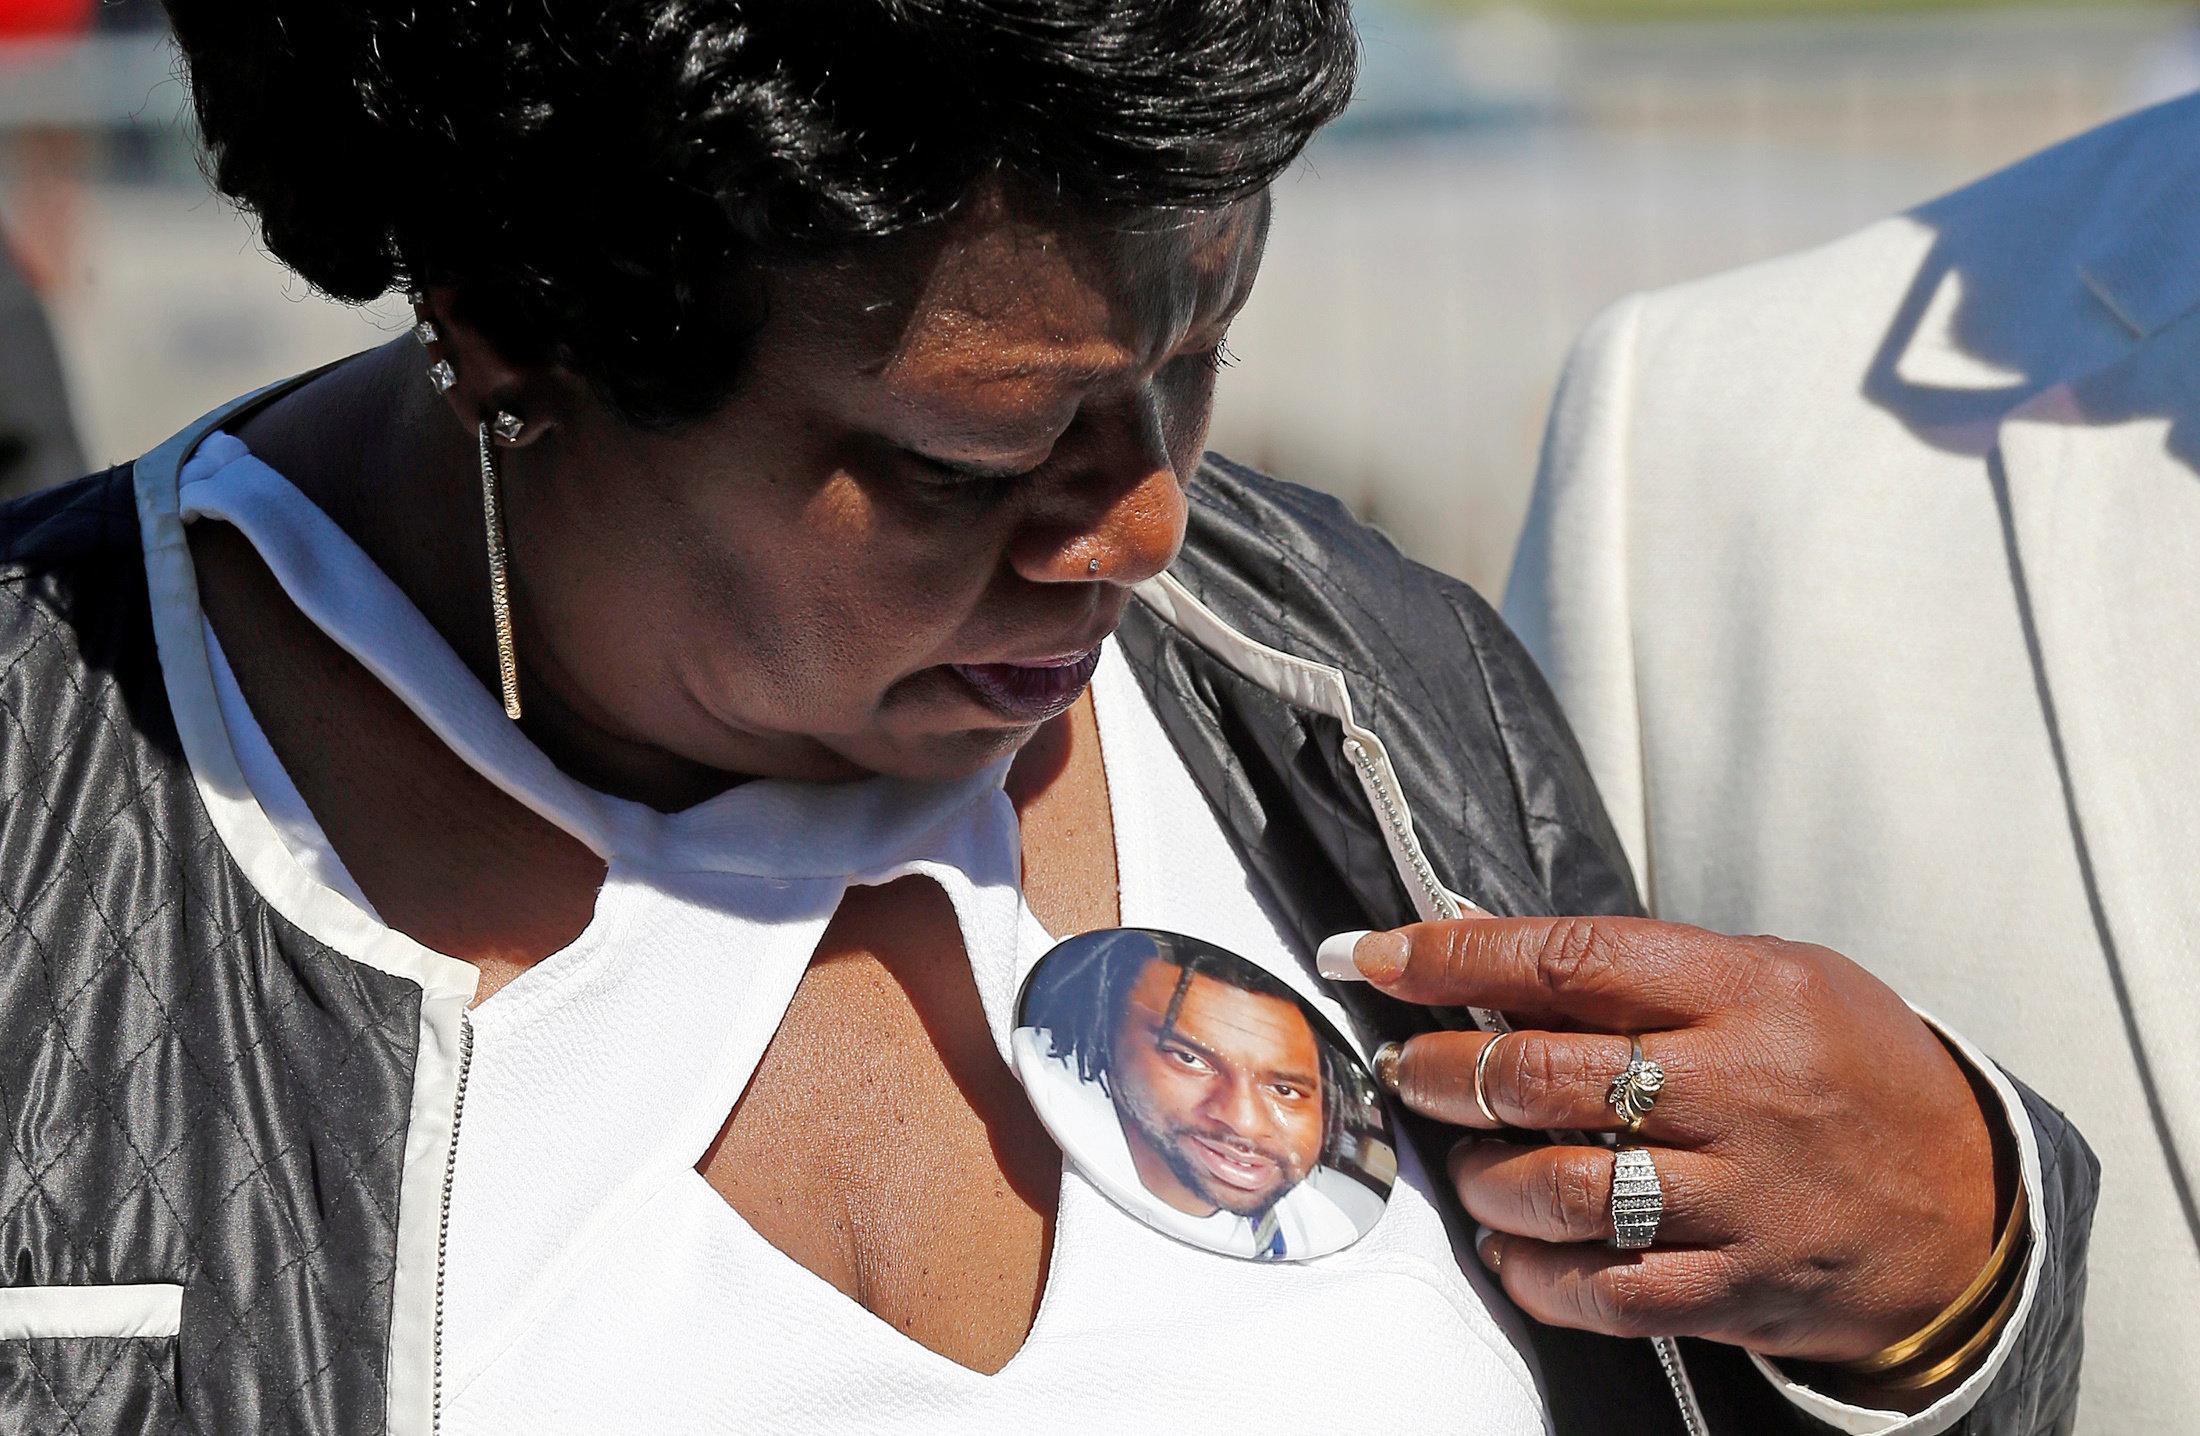 5 Disturbing Statements By The Cop Who Shot Philando